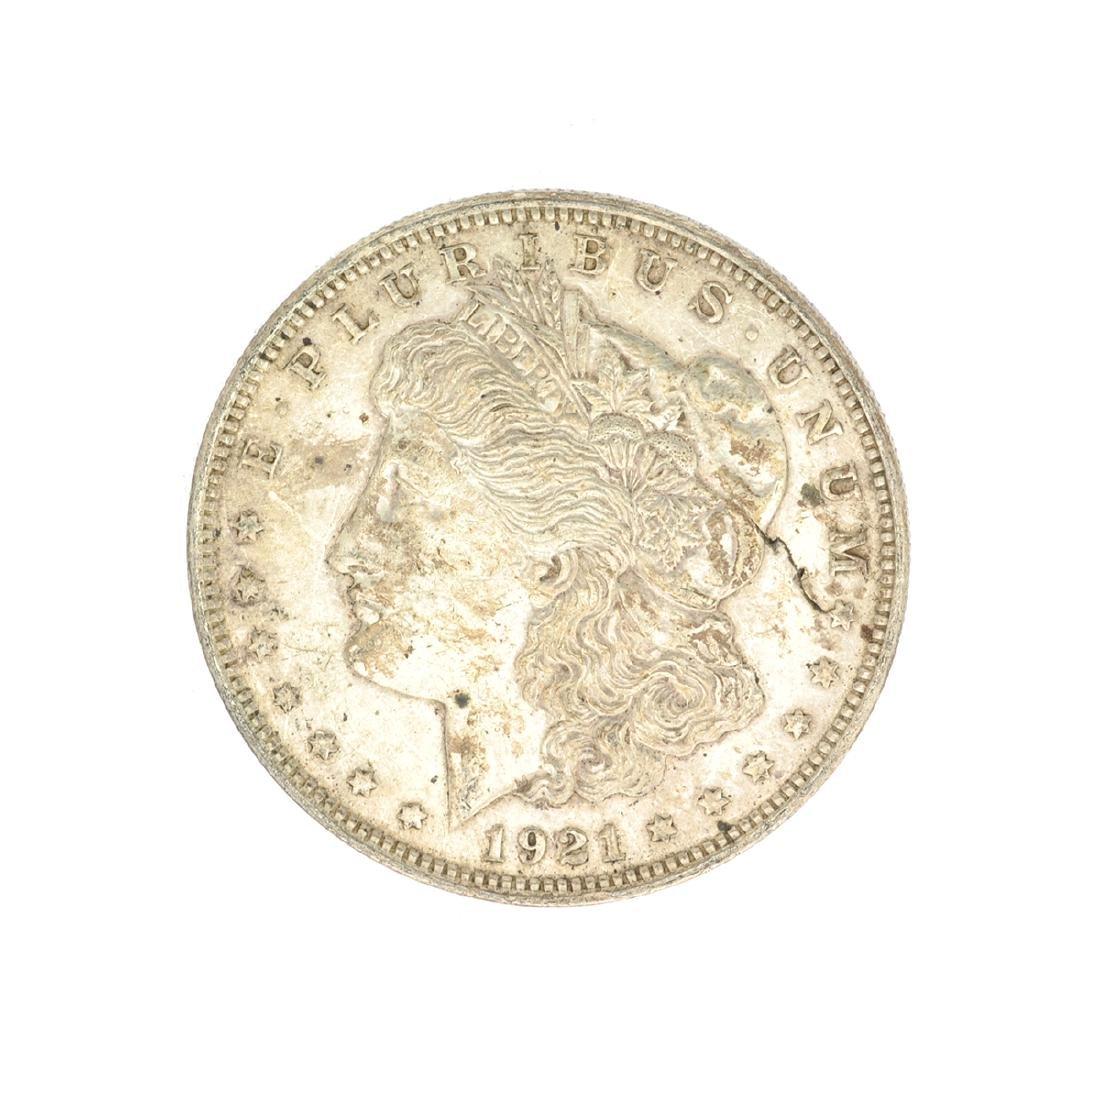 Rare 1921 U.S. Morgan Silver Dollar